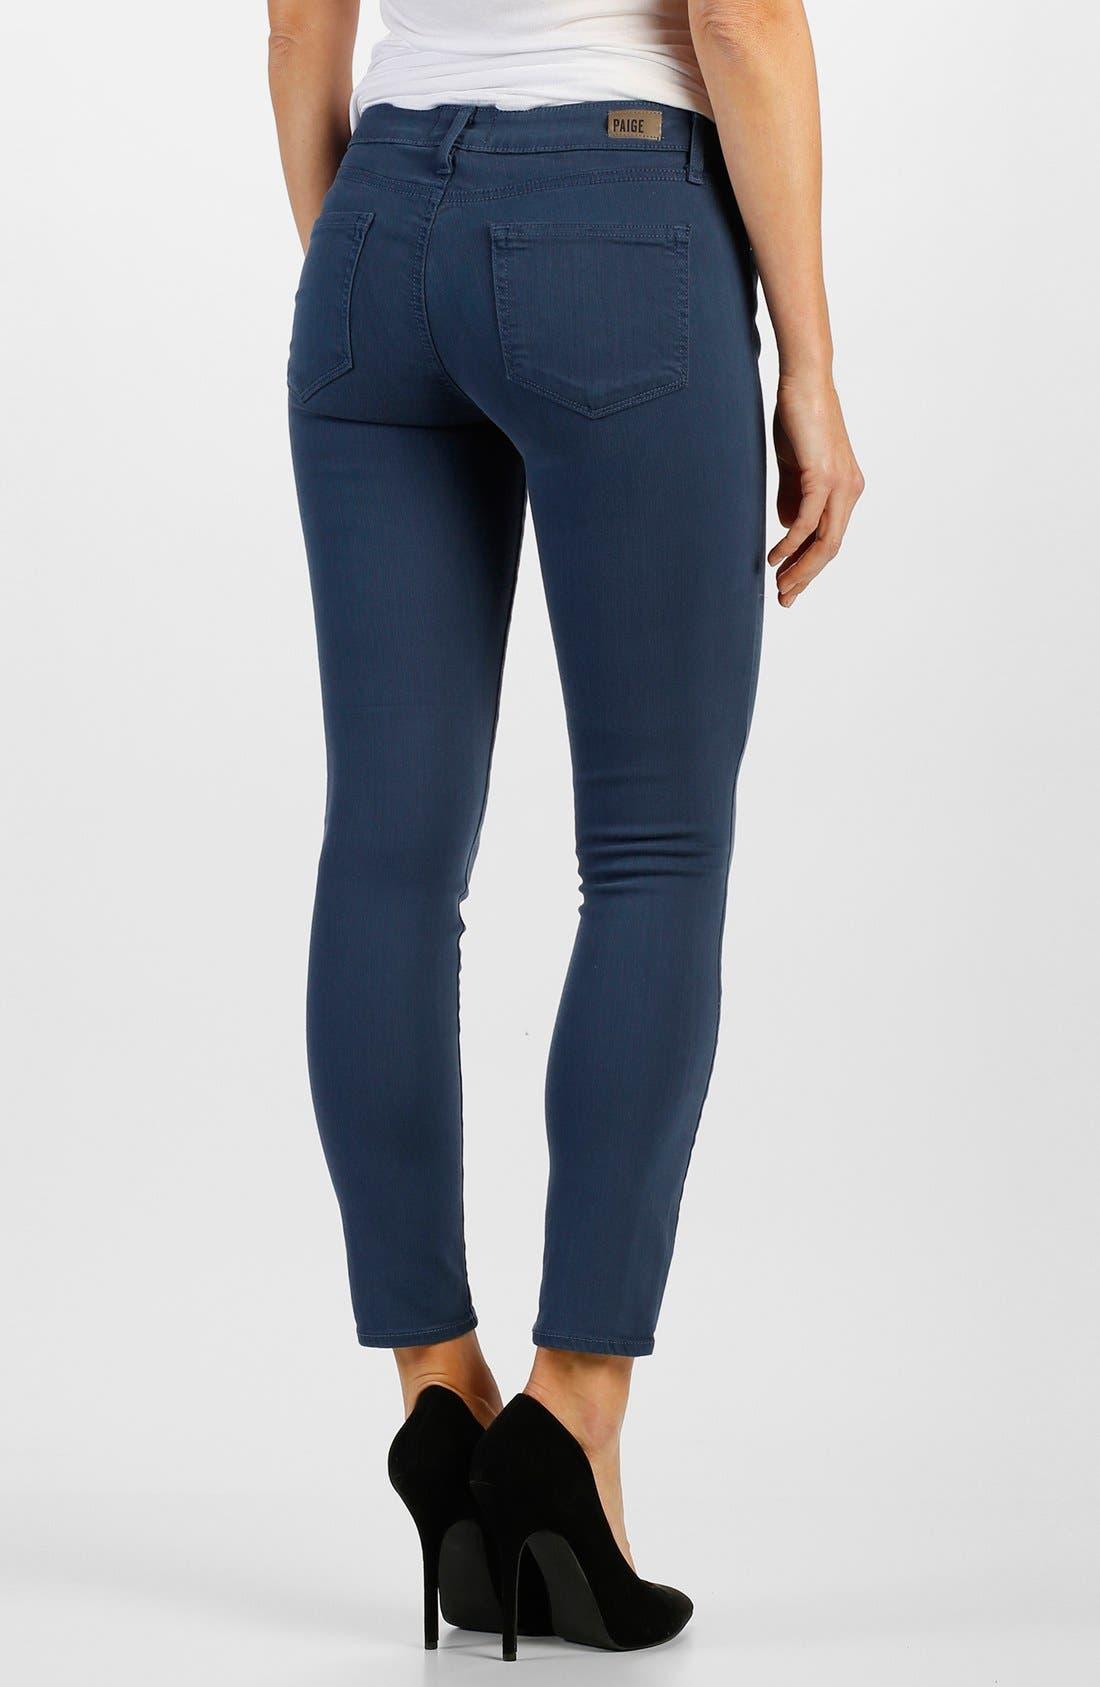 Alternate Image 2  - Paige Denim 'Verdugo' Ankle Ultra Skinny Jeans (Cornflower Blue)